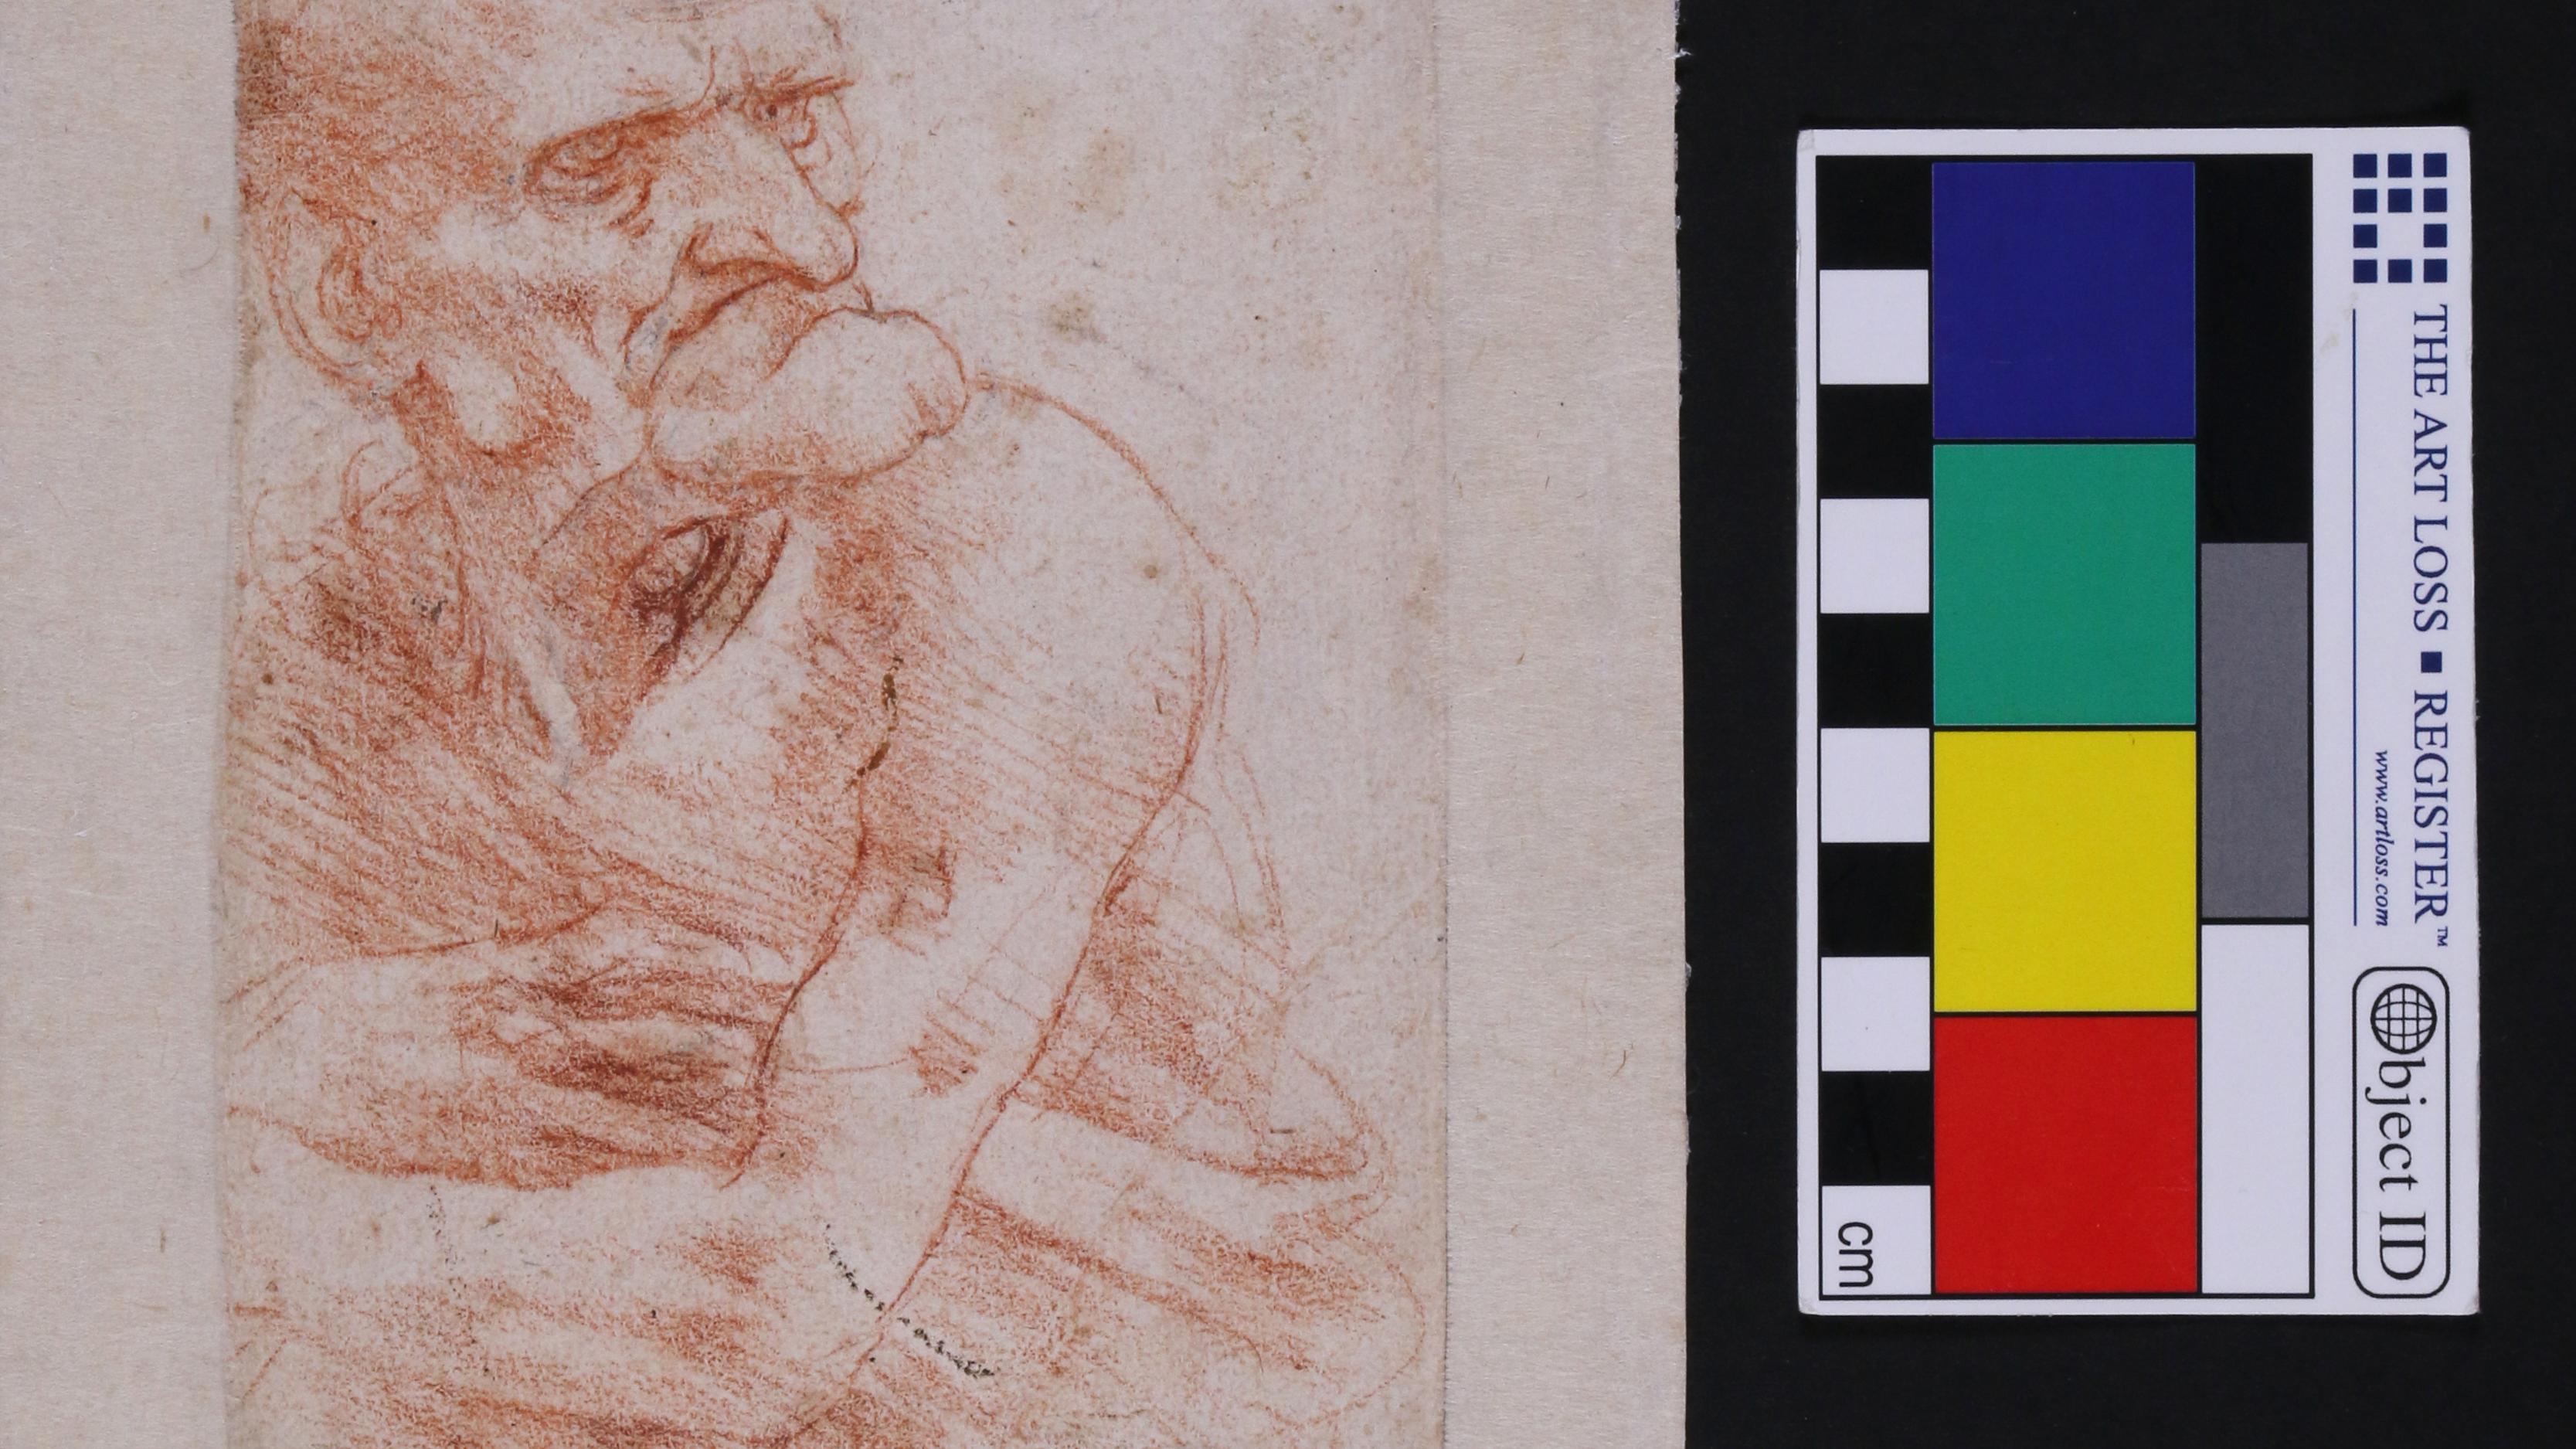 Hidden world of bacteria and fungi discovered on Leonardo da Vinci's drawings thumbnail